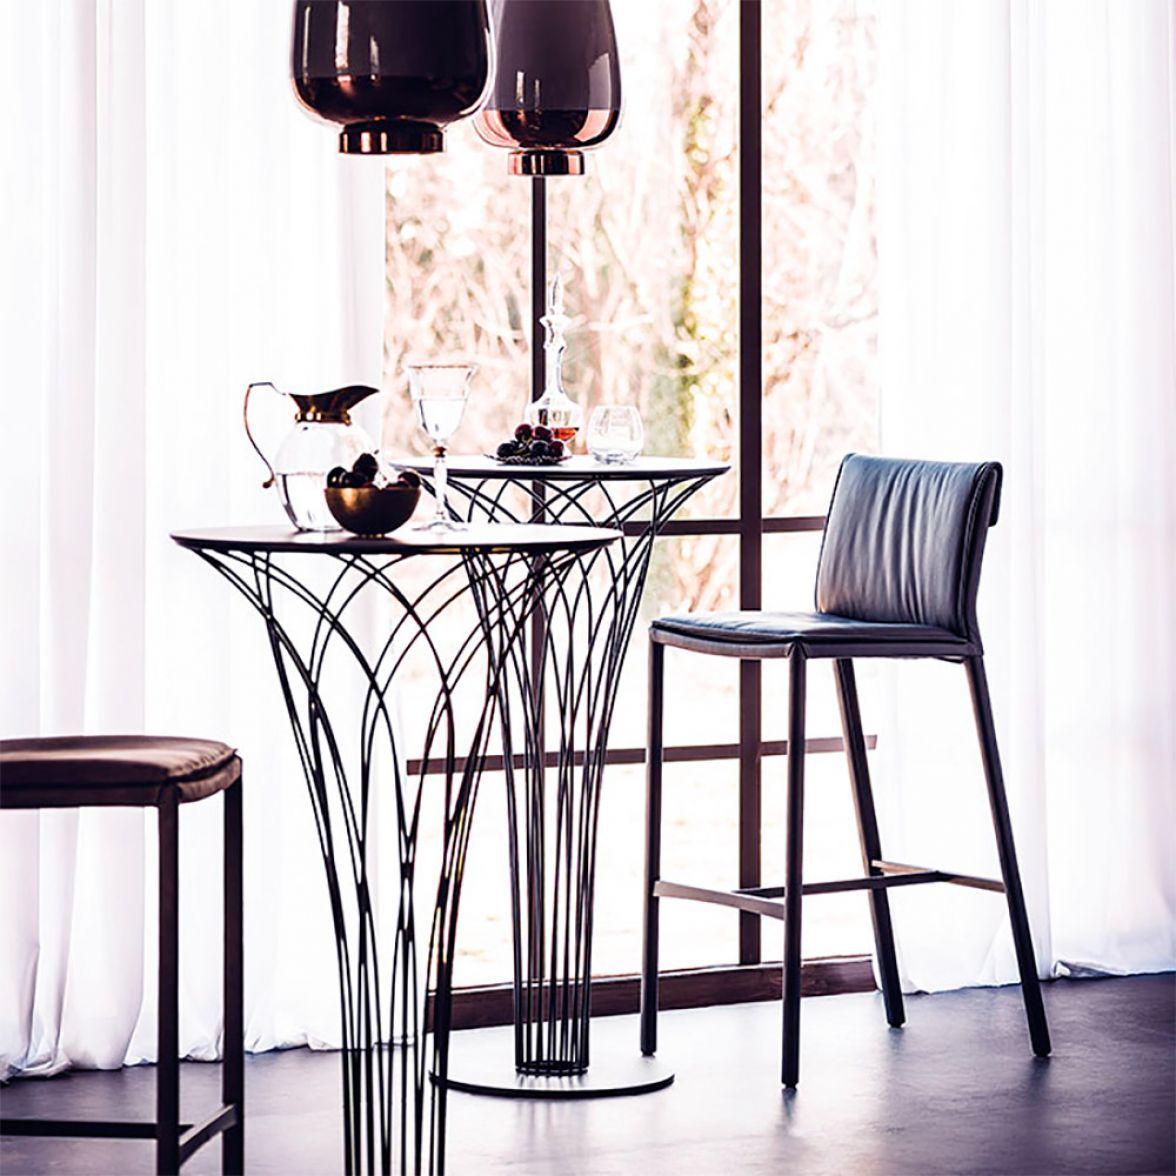 Isabel stool